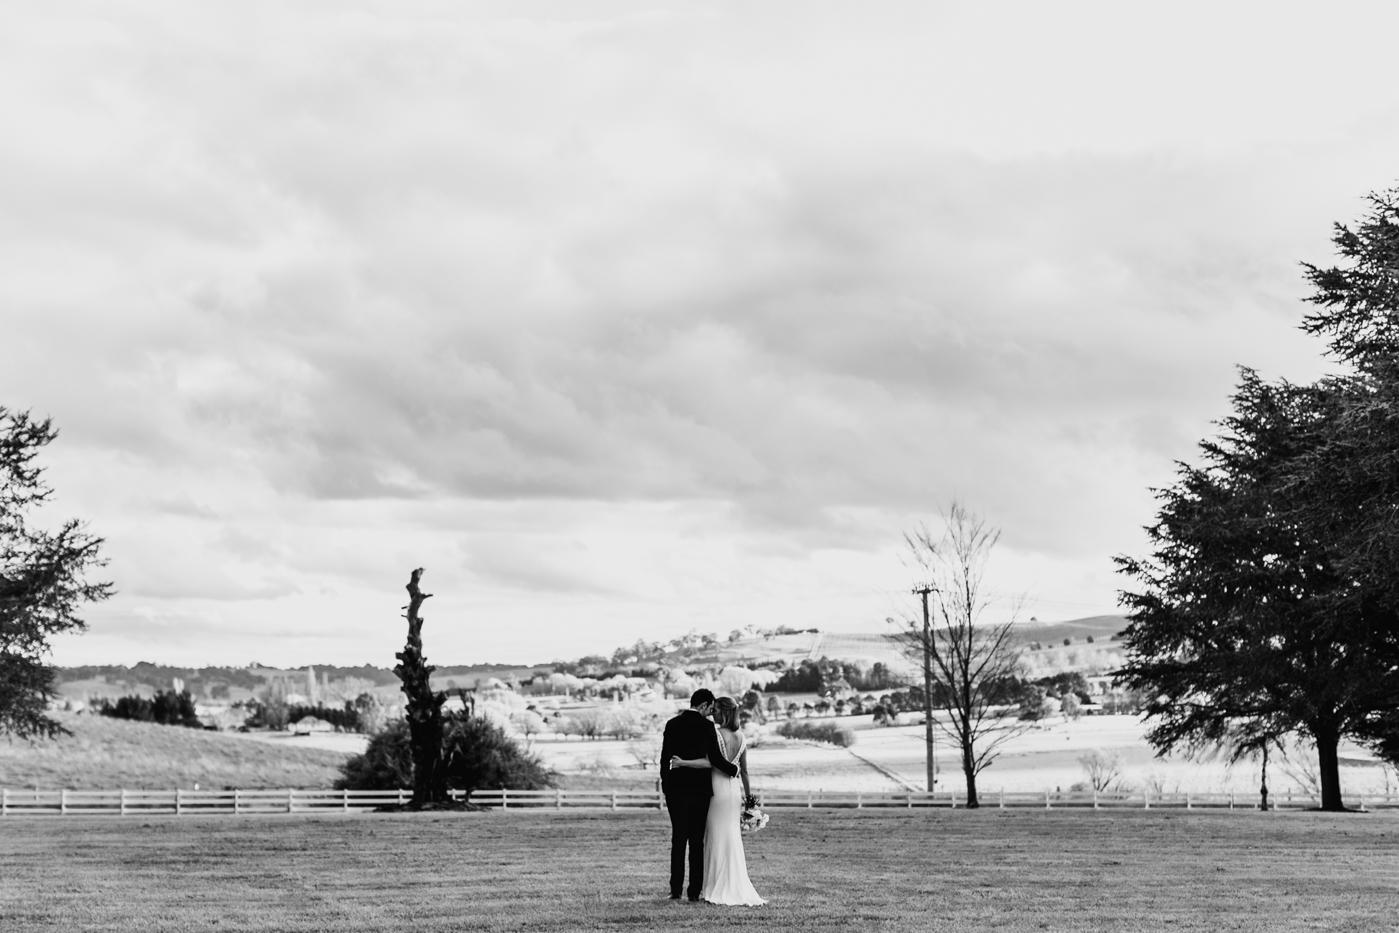 Bridget & James - Orange Country Wedding - Samantha Heather Photography-147.jpg